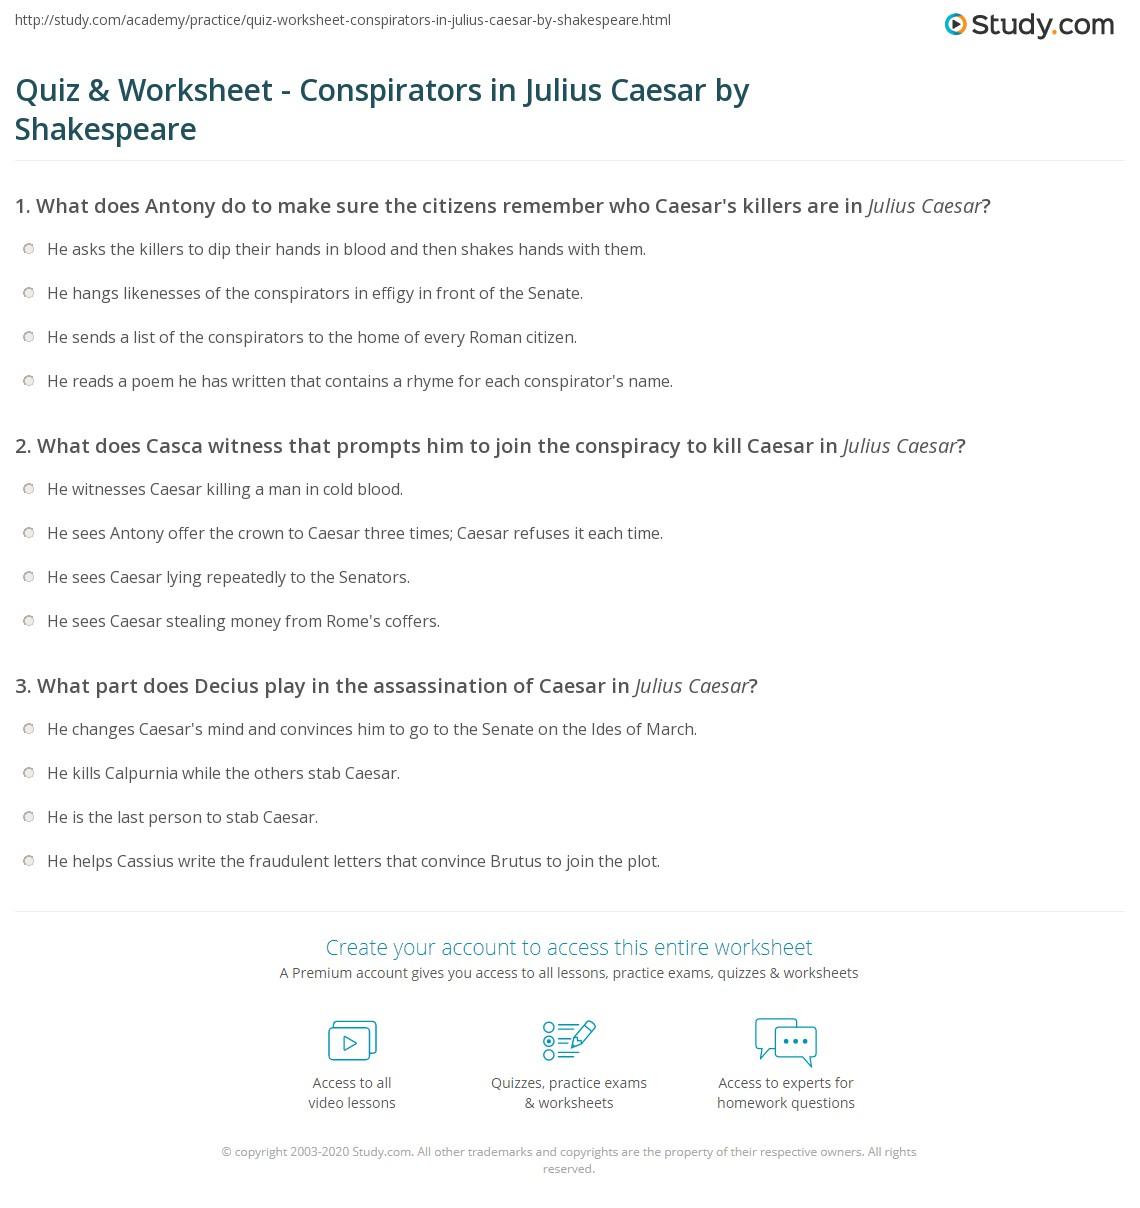 Quiz Worksheet Conspirators In Julius Caesar By Shakespeare